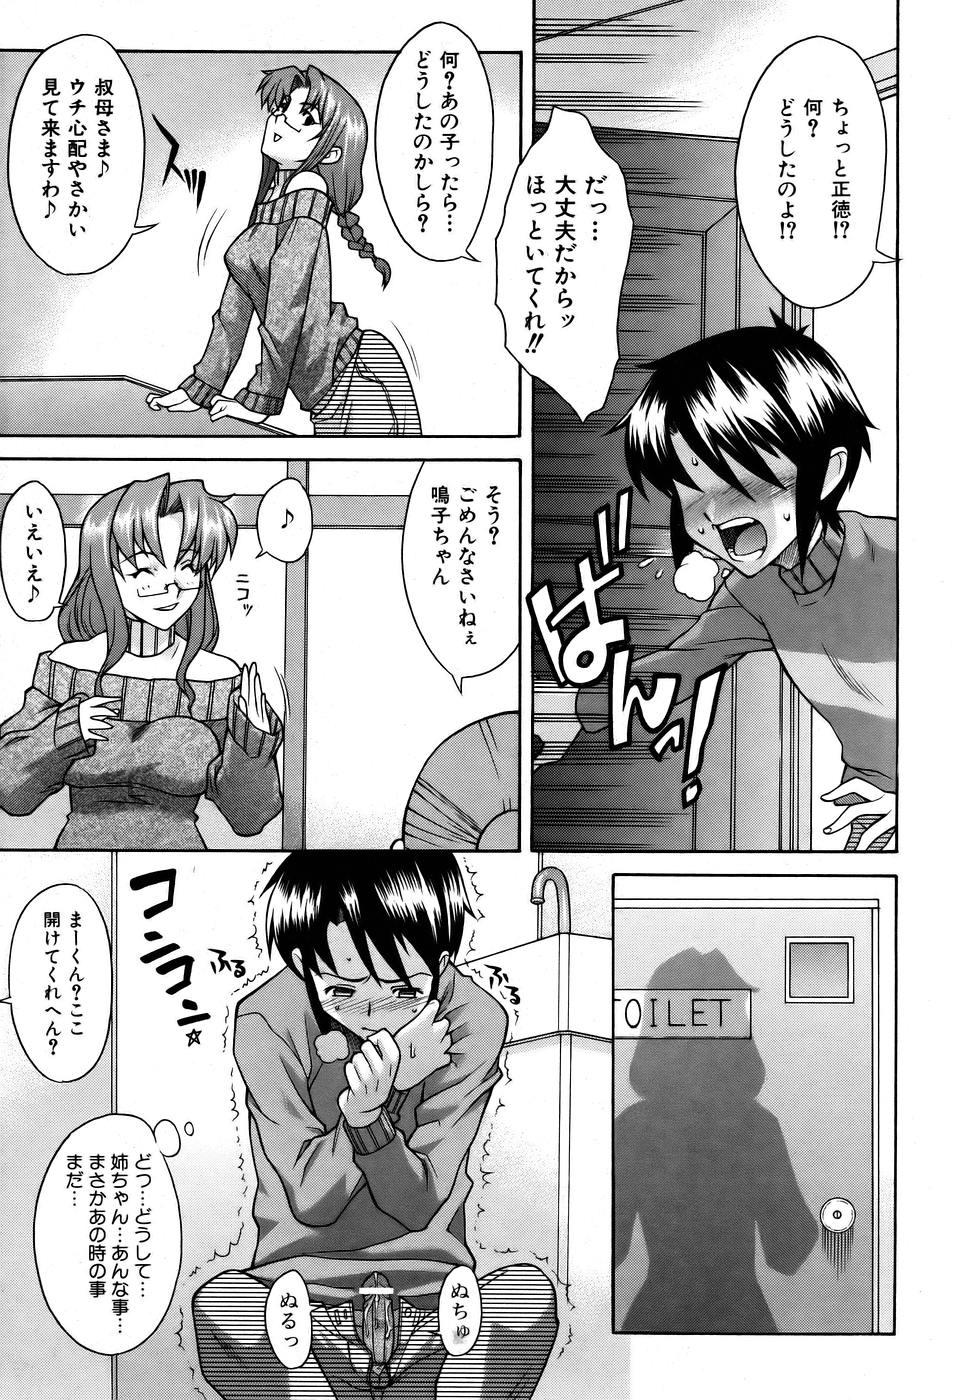 COMIC AUN 2005-12 Vol. 115 88